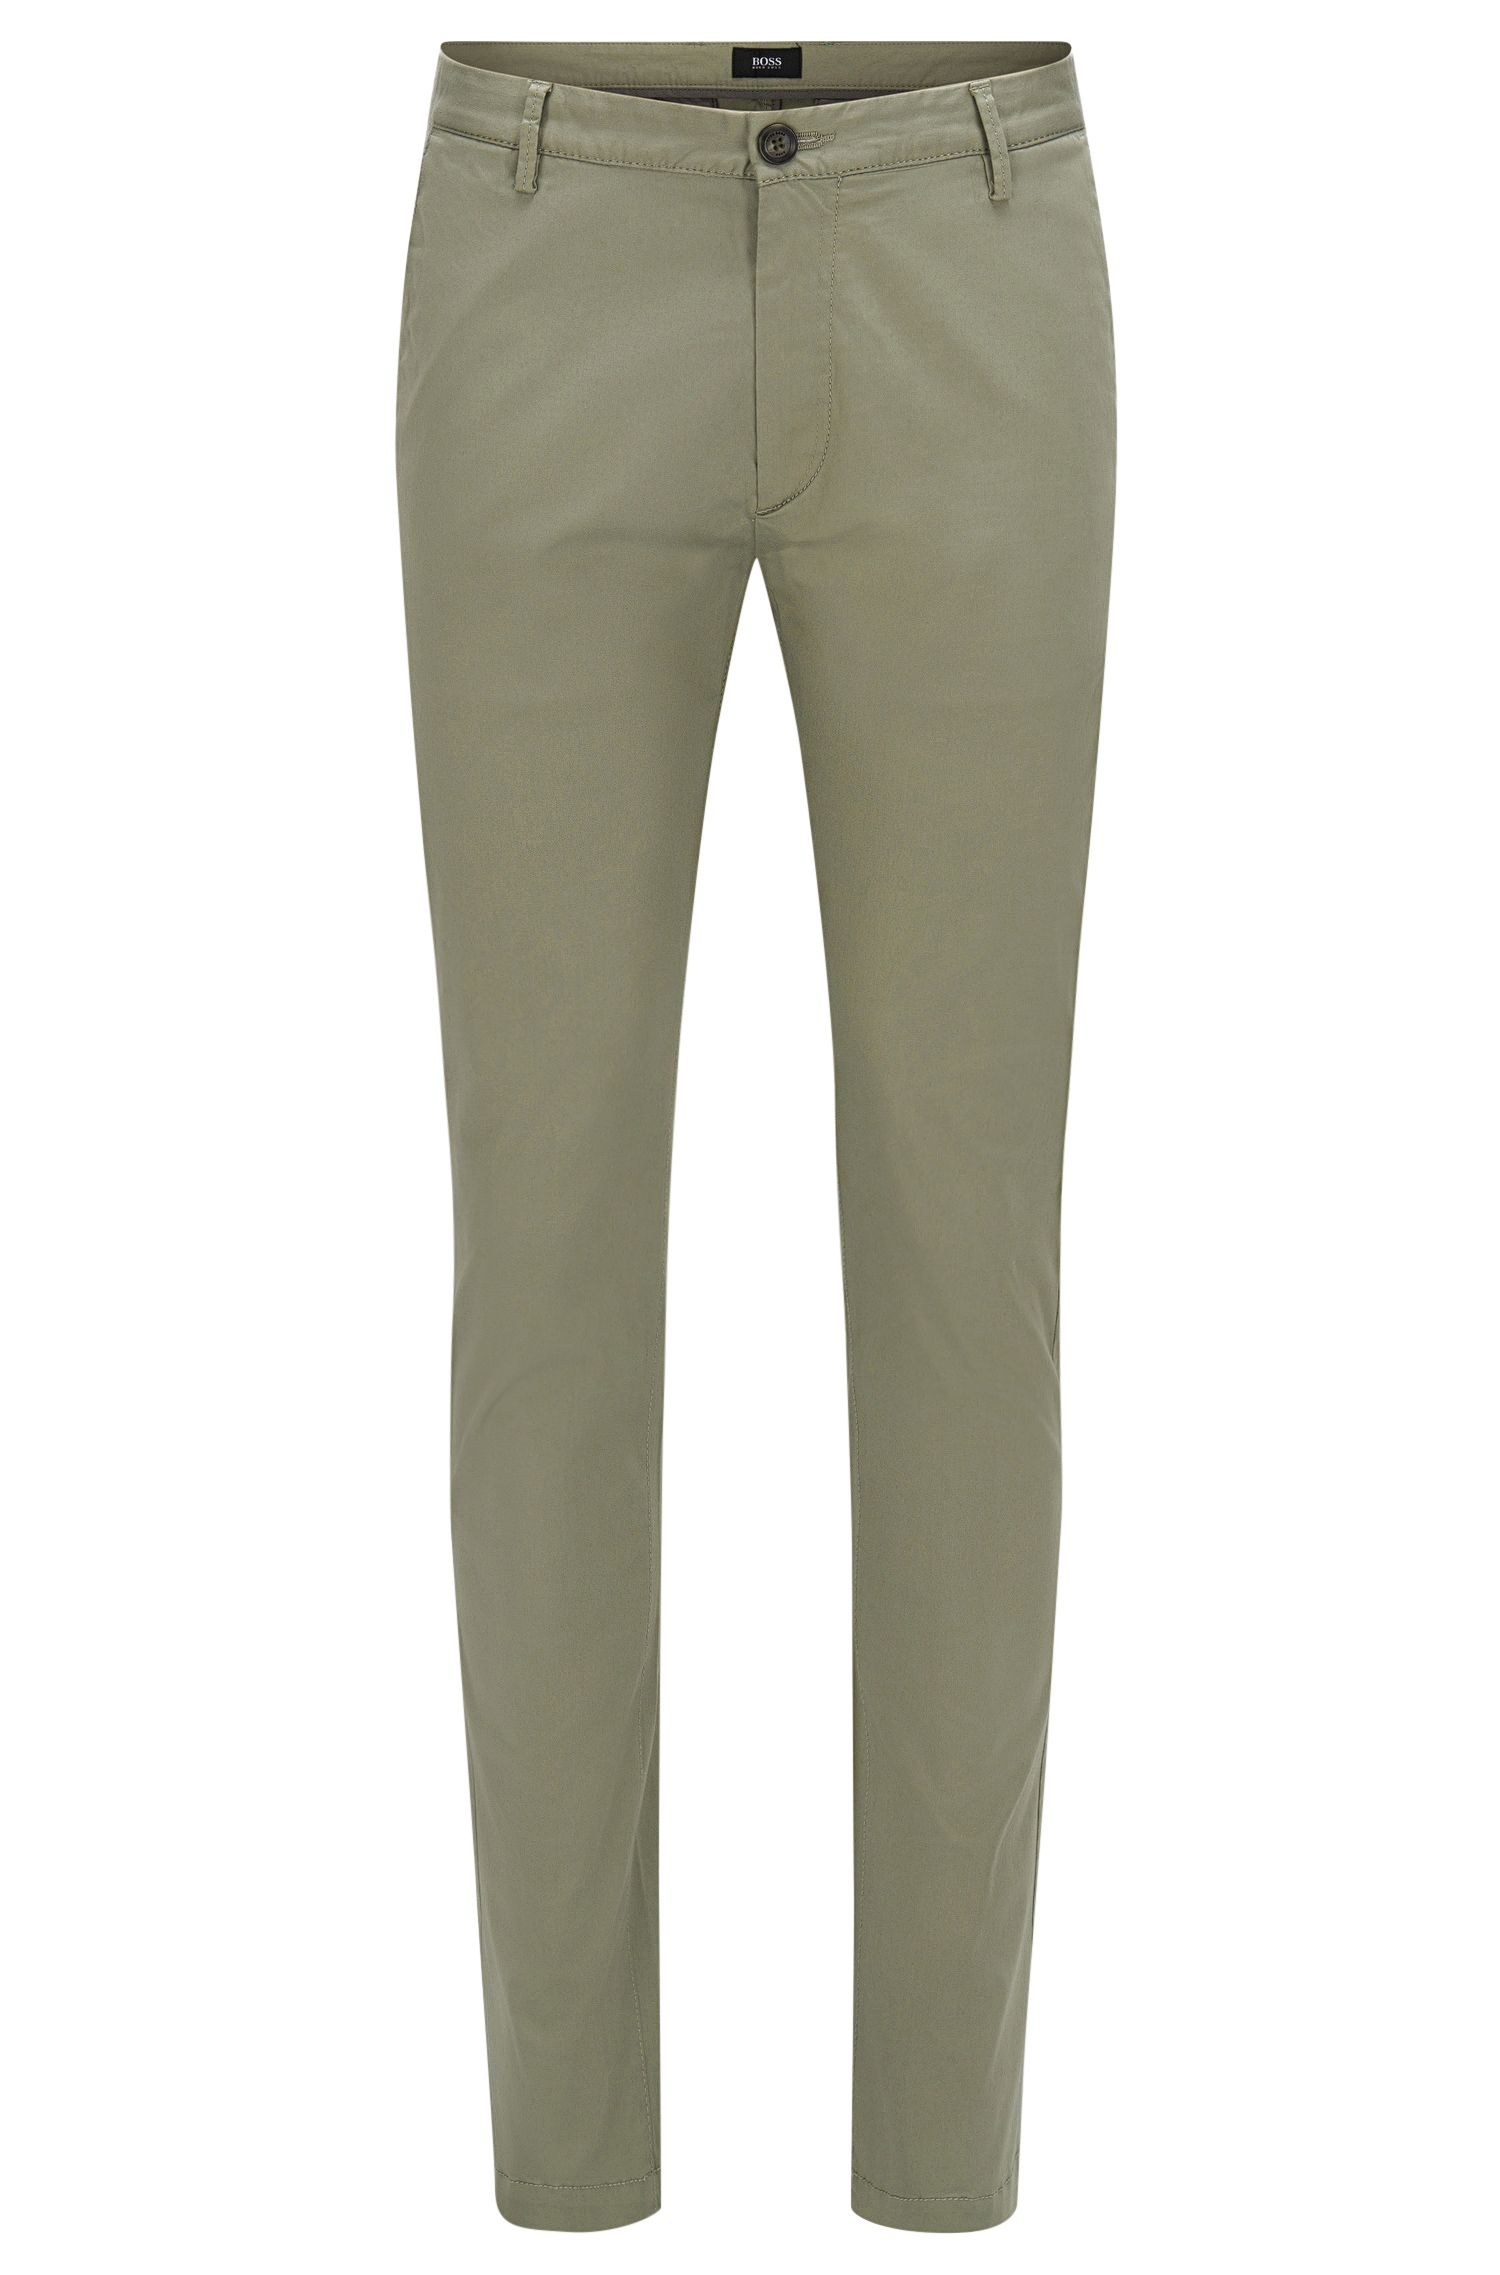 'Rice W' | Slim Fit, Italian Stretch Cotton Pants